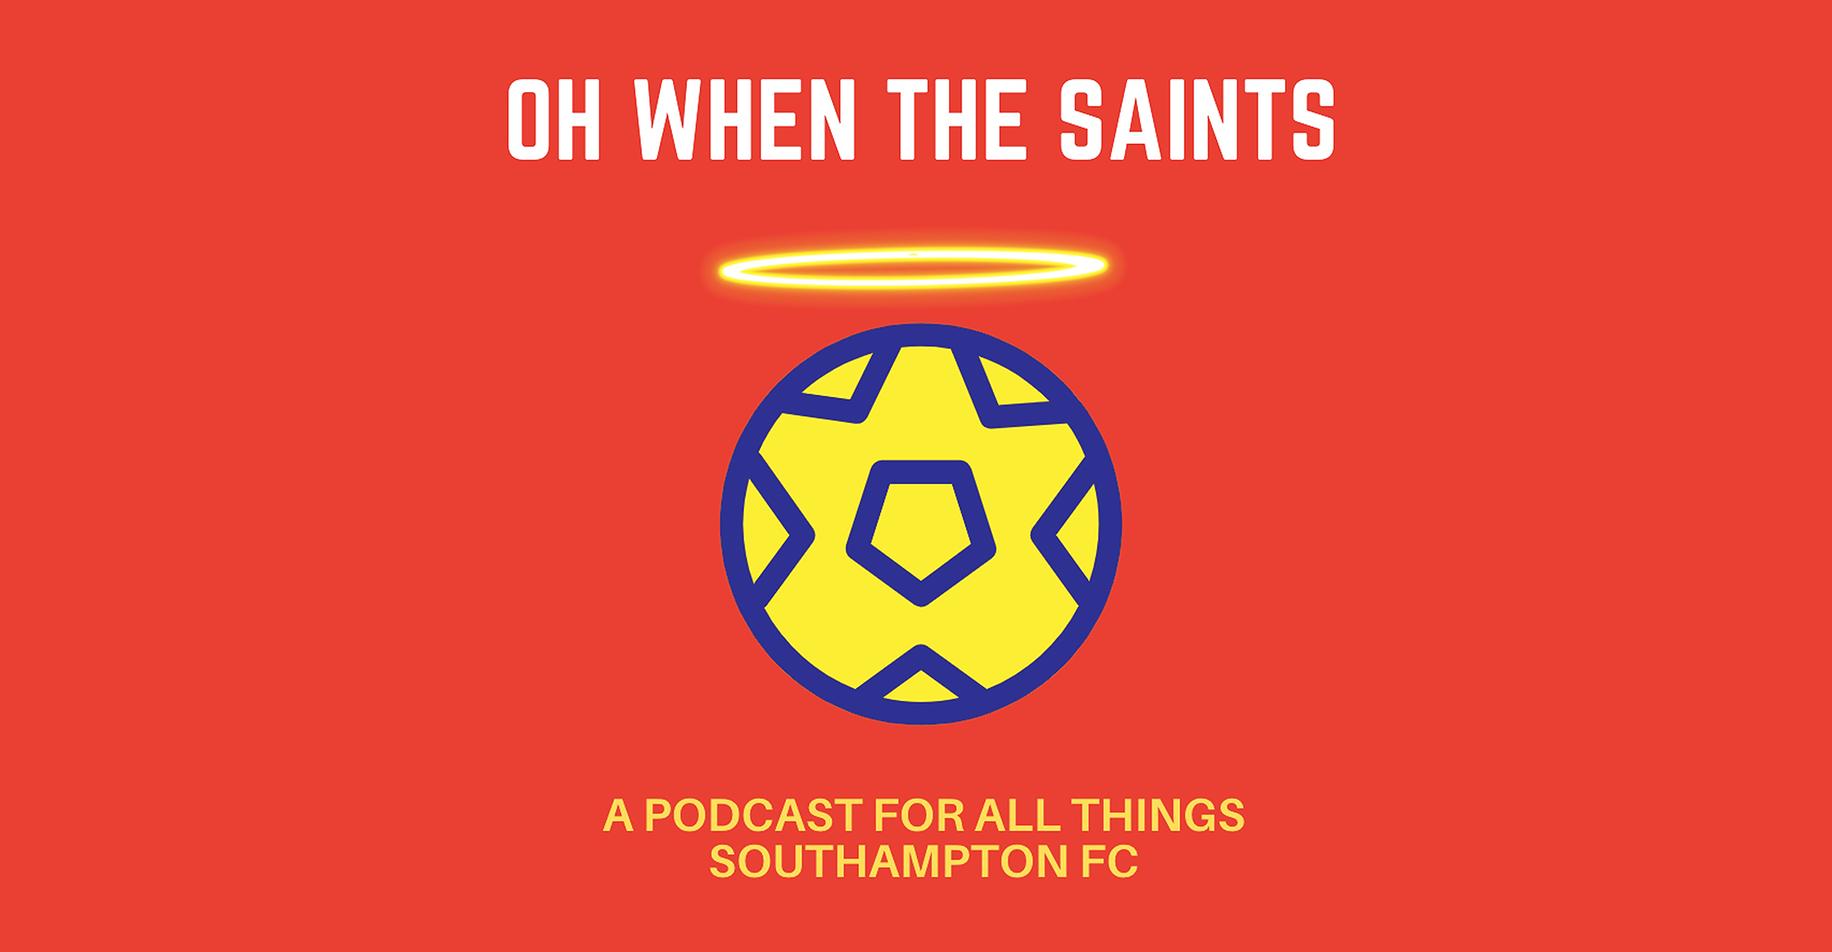 Oh When The Saints podcast Radhi Jaidi interview Southampton Saints latest news